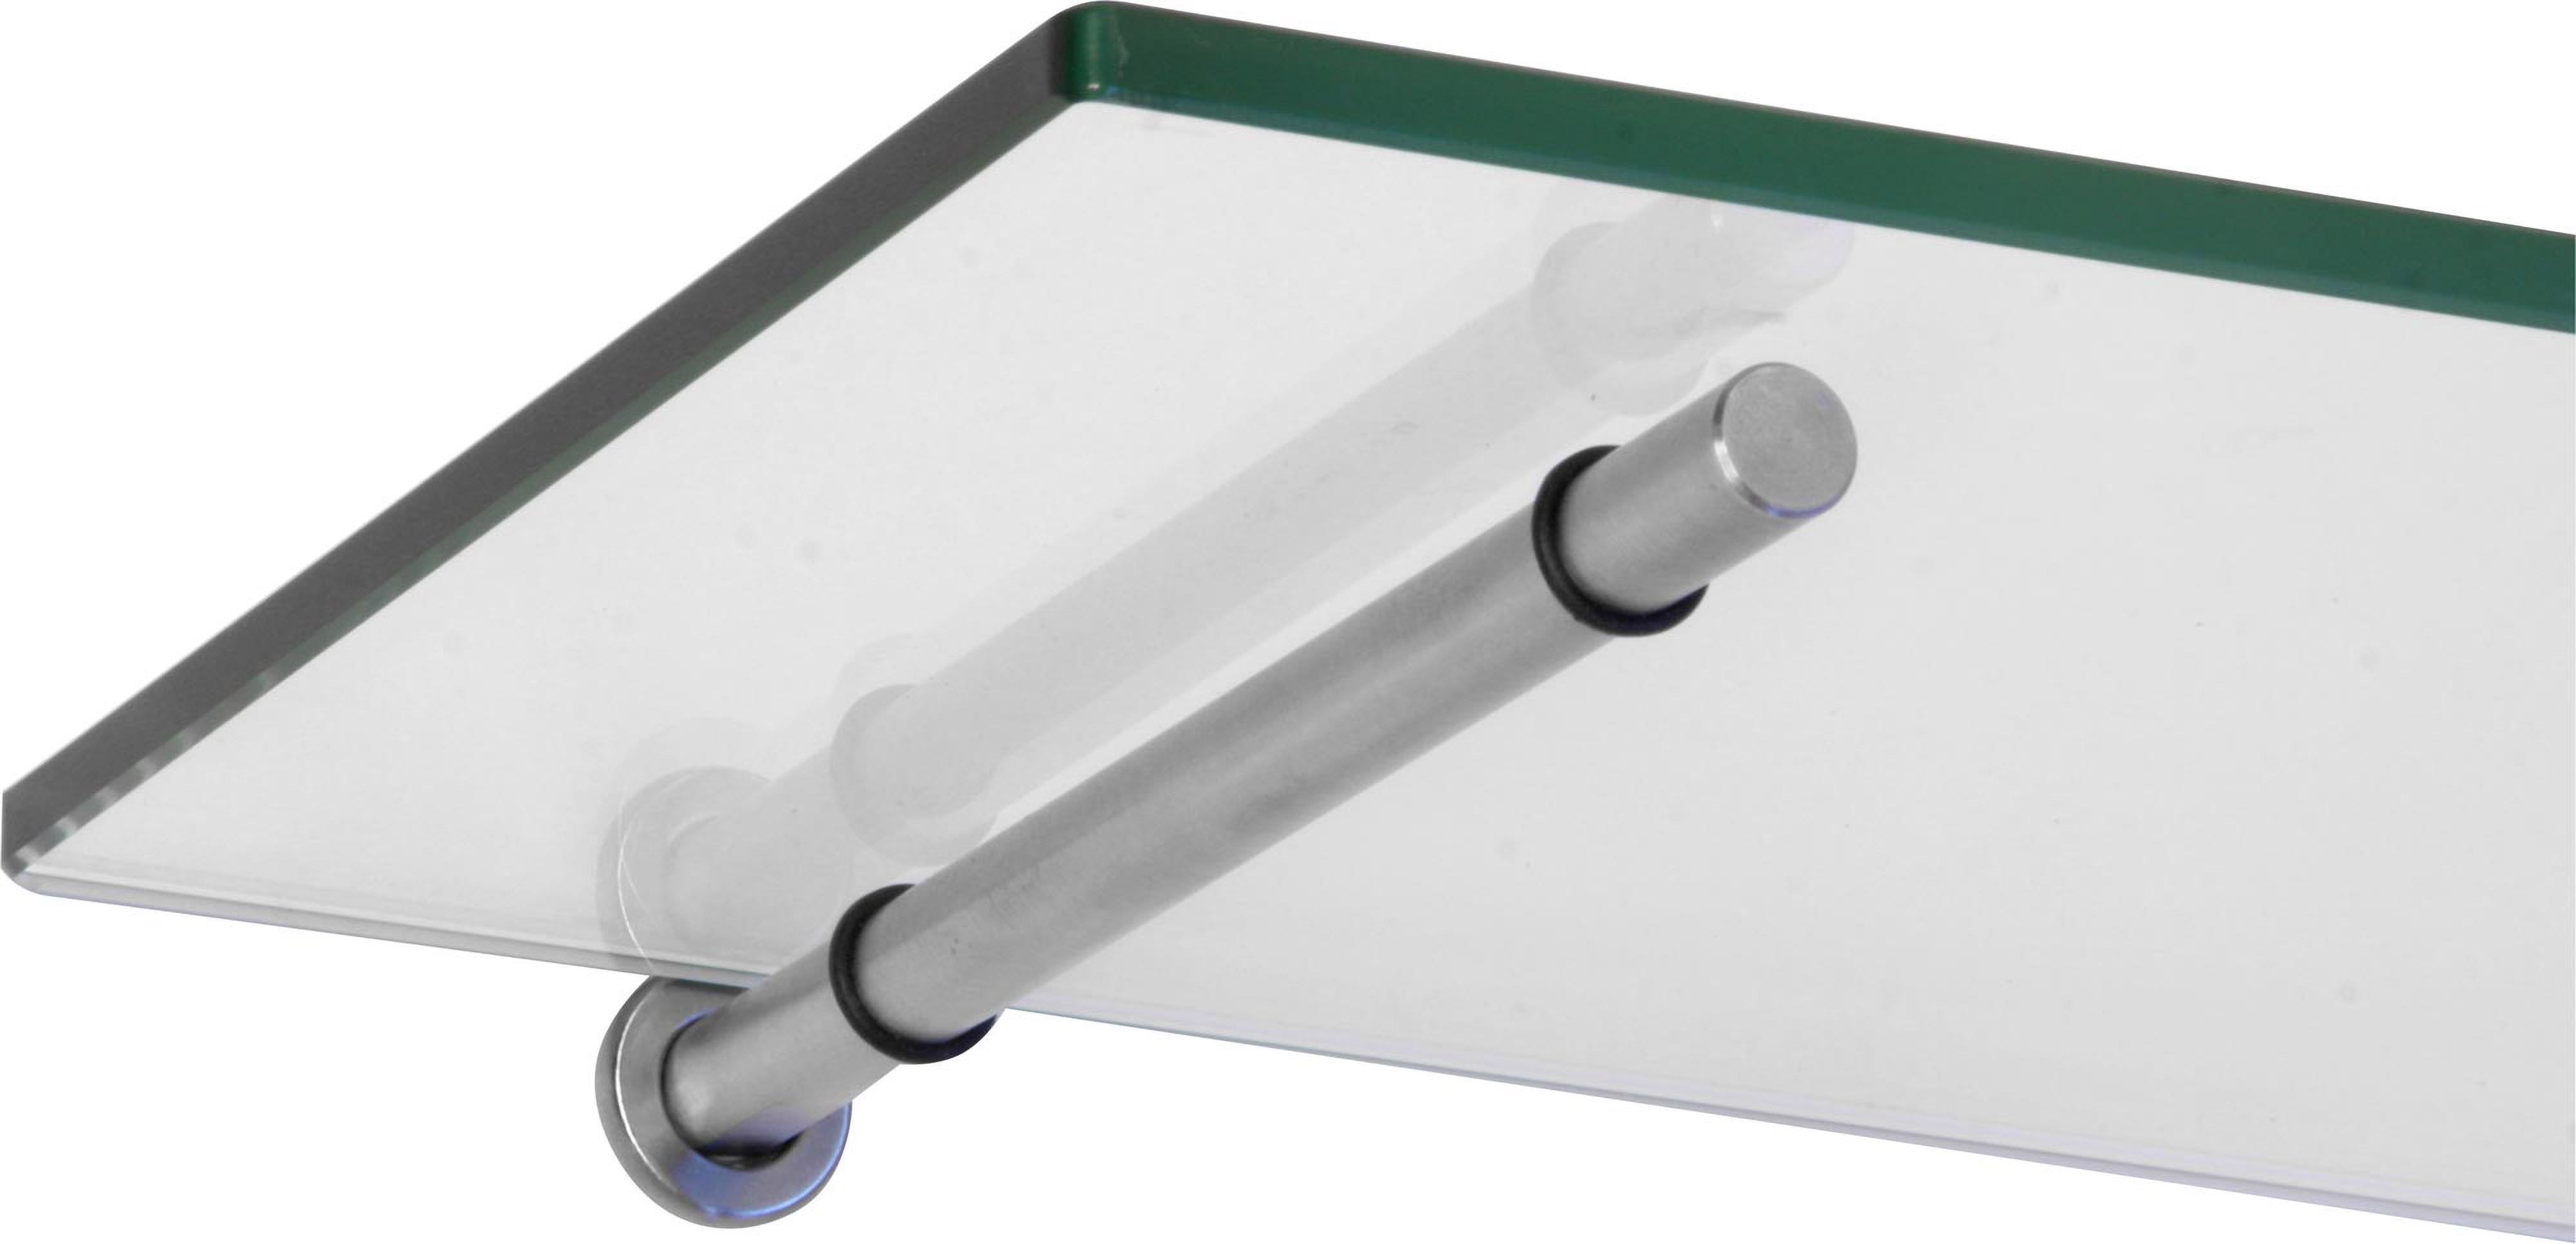 glasregal 8 mm stick tablarhalter 6 gr en klarglas satiniert regal glasablage ebay. Black Bedroom Furniture Sets. Home Design Ideas